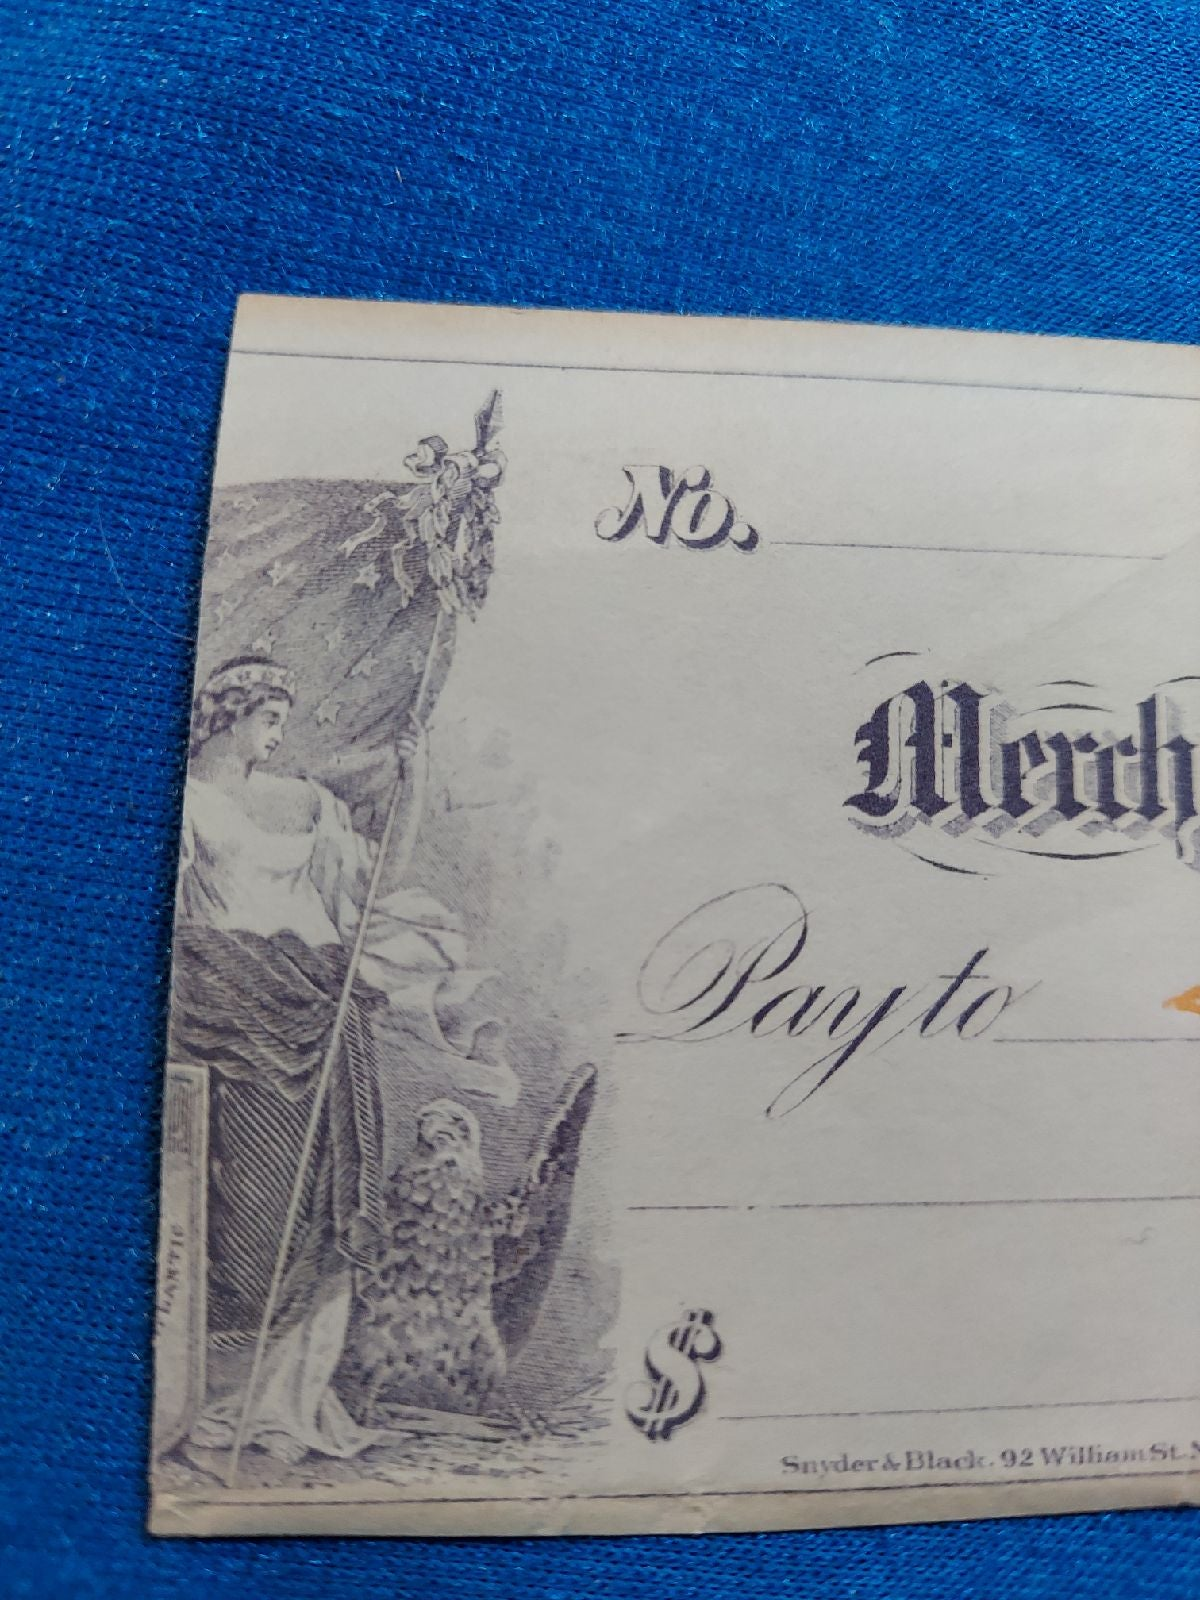 RARE Paper money, Unc. Early 1880's